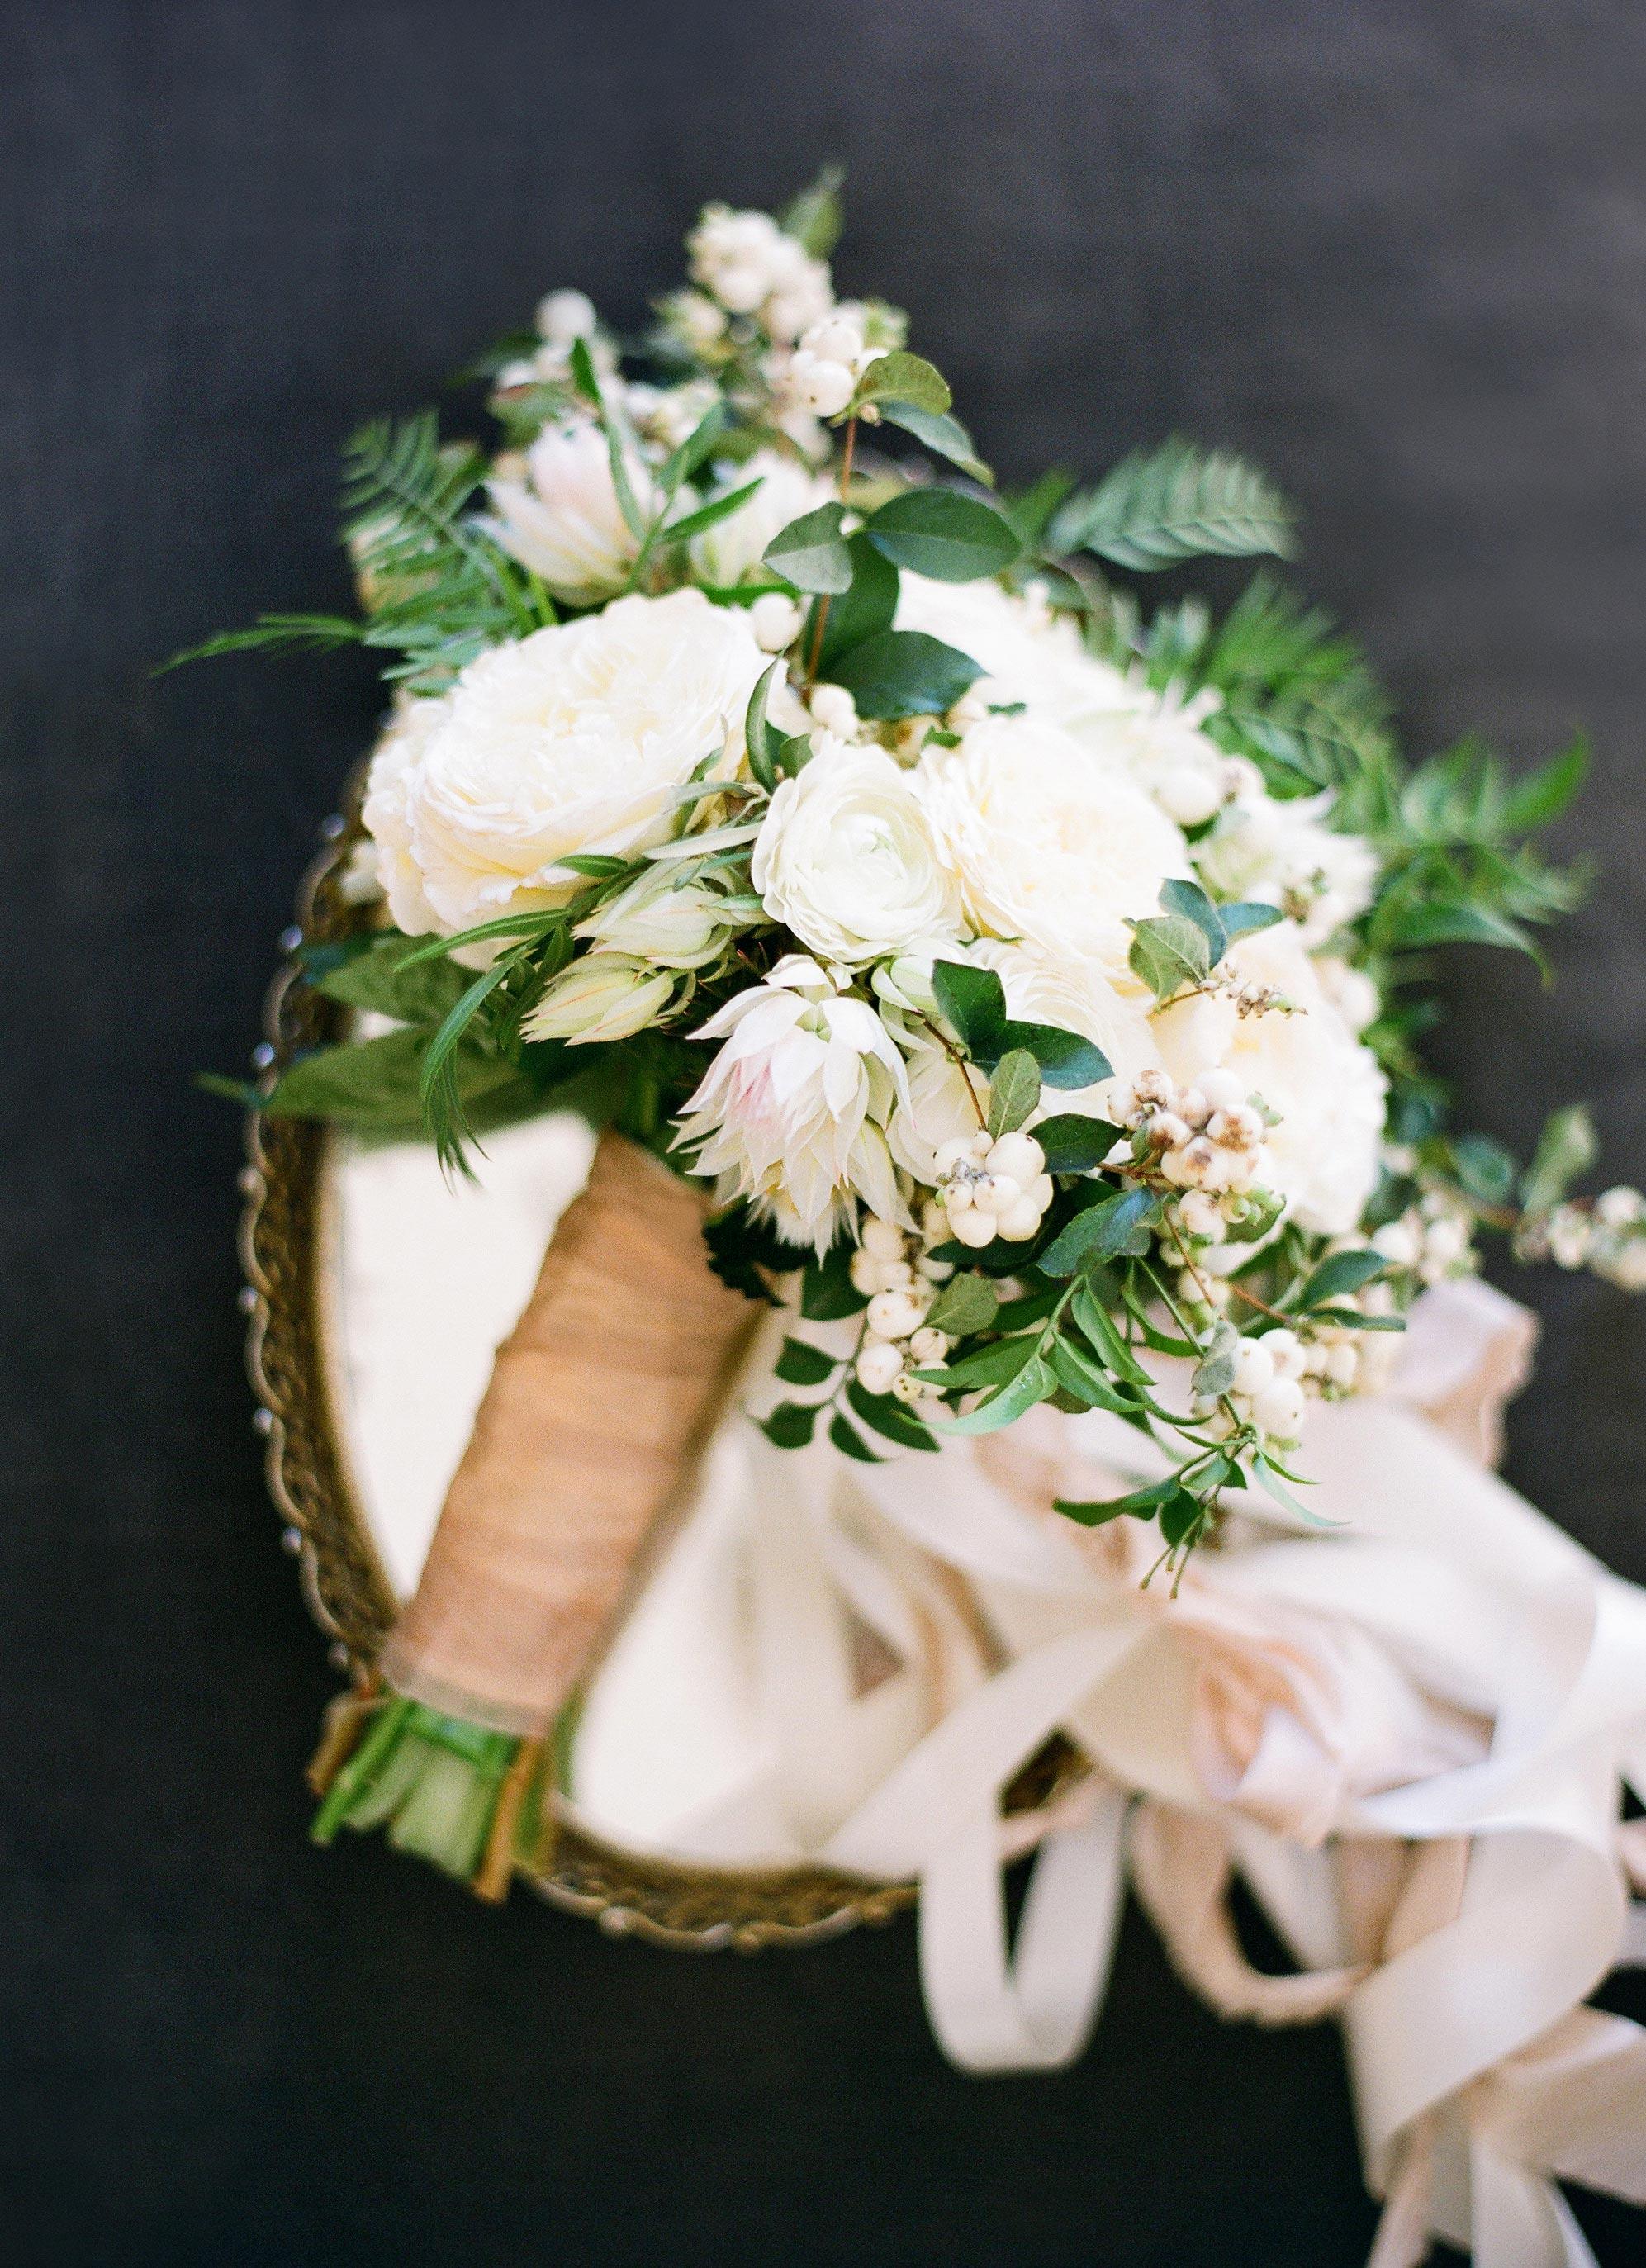 wedding bouquet with berries